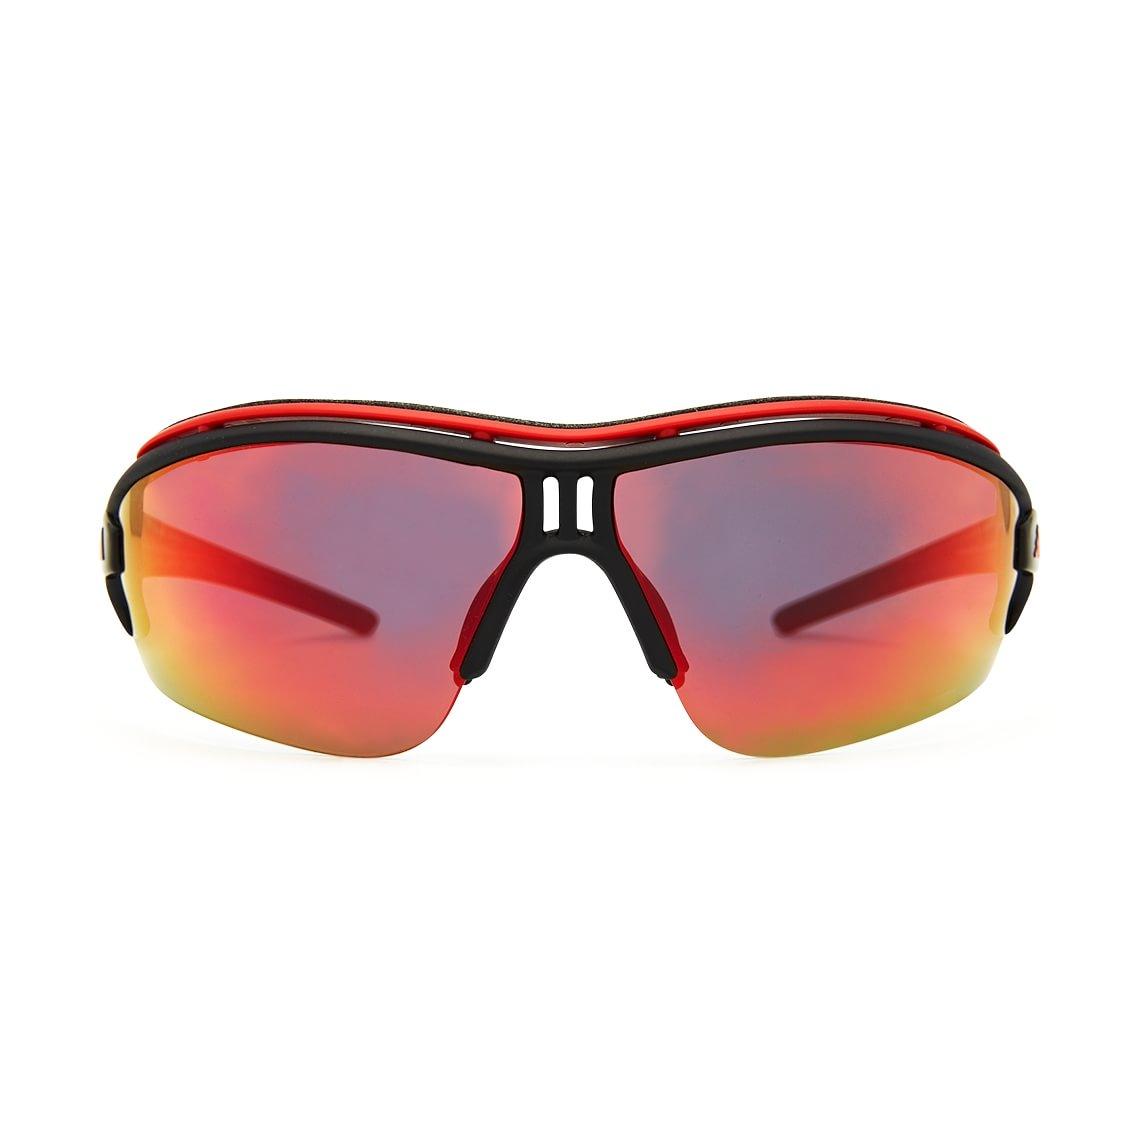 Adidas Evil Eye Halfrim Pro Large Red Mirror A181 00 6088